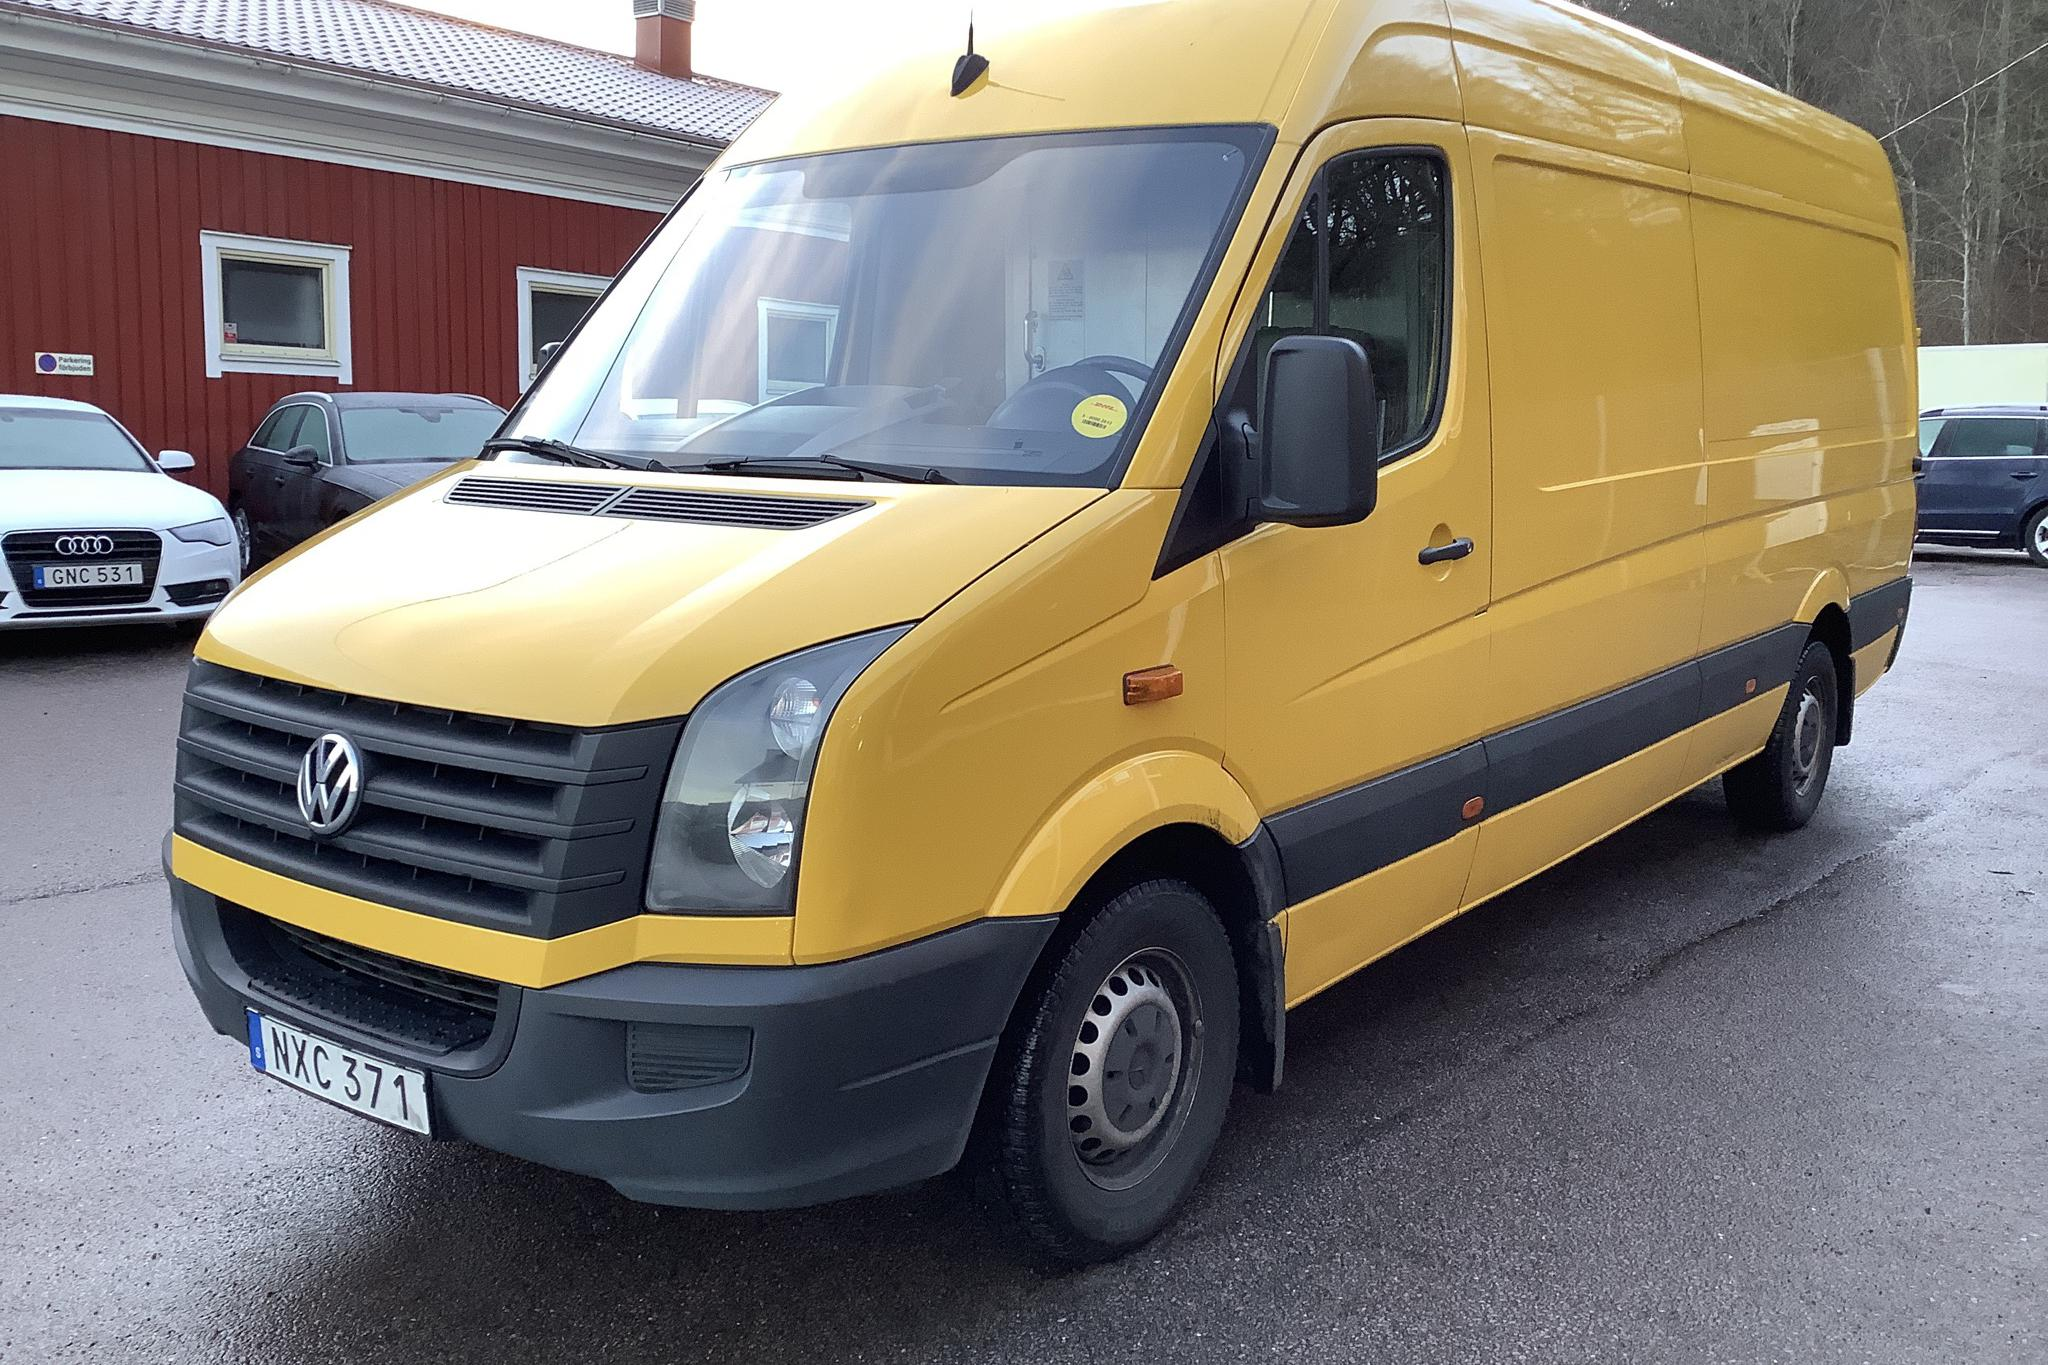 VW Crafter 35 2.0 TDI Skåp (136hk) - 14 605 mil - Manuell - Light Yellow - 2016